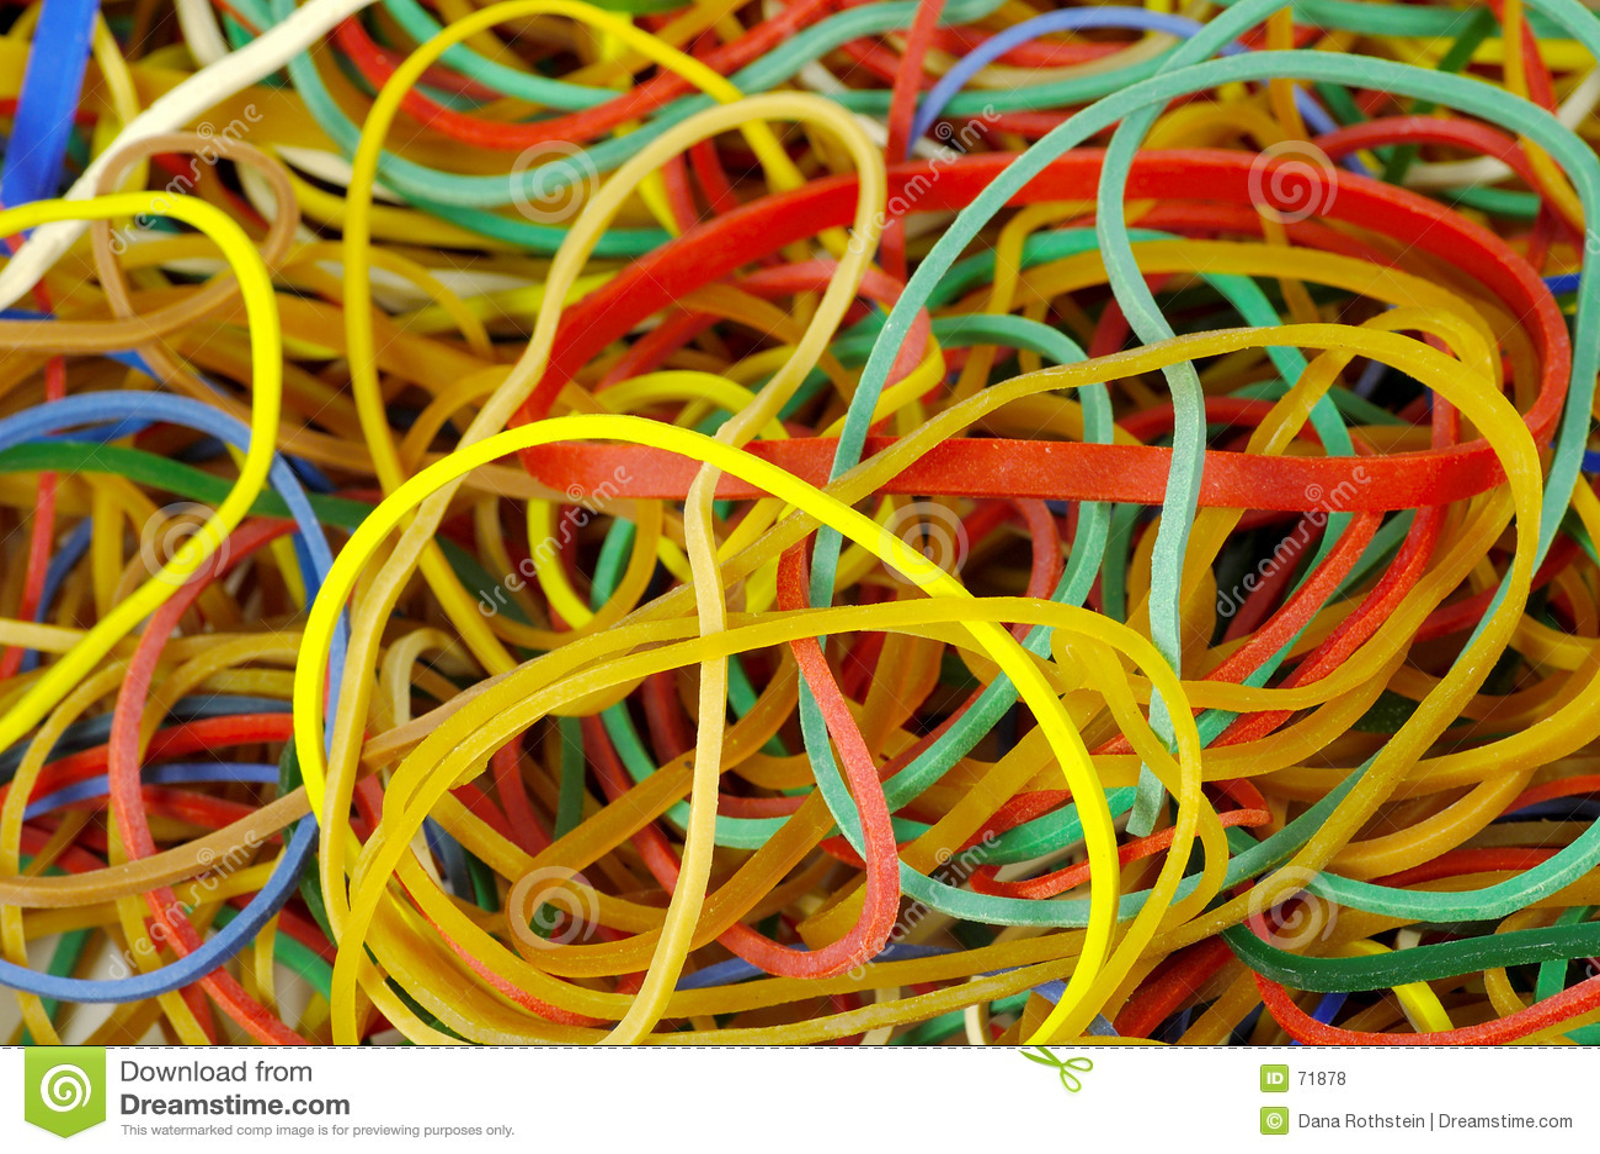 Rubberband Background Royalty Free Stock Photos Image 71878